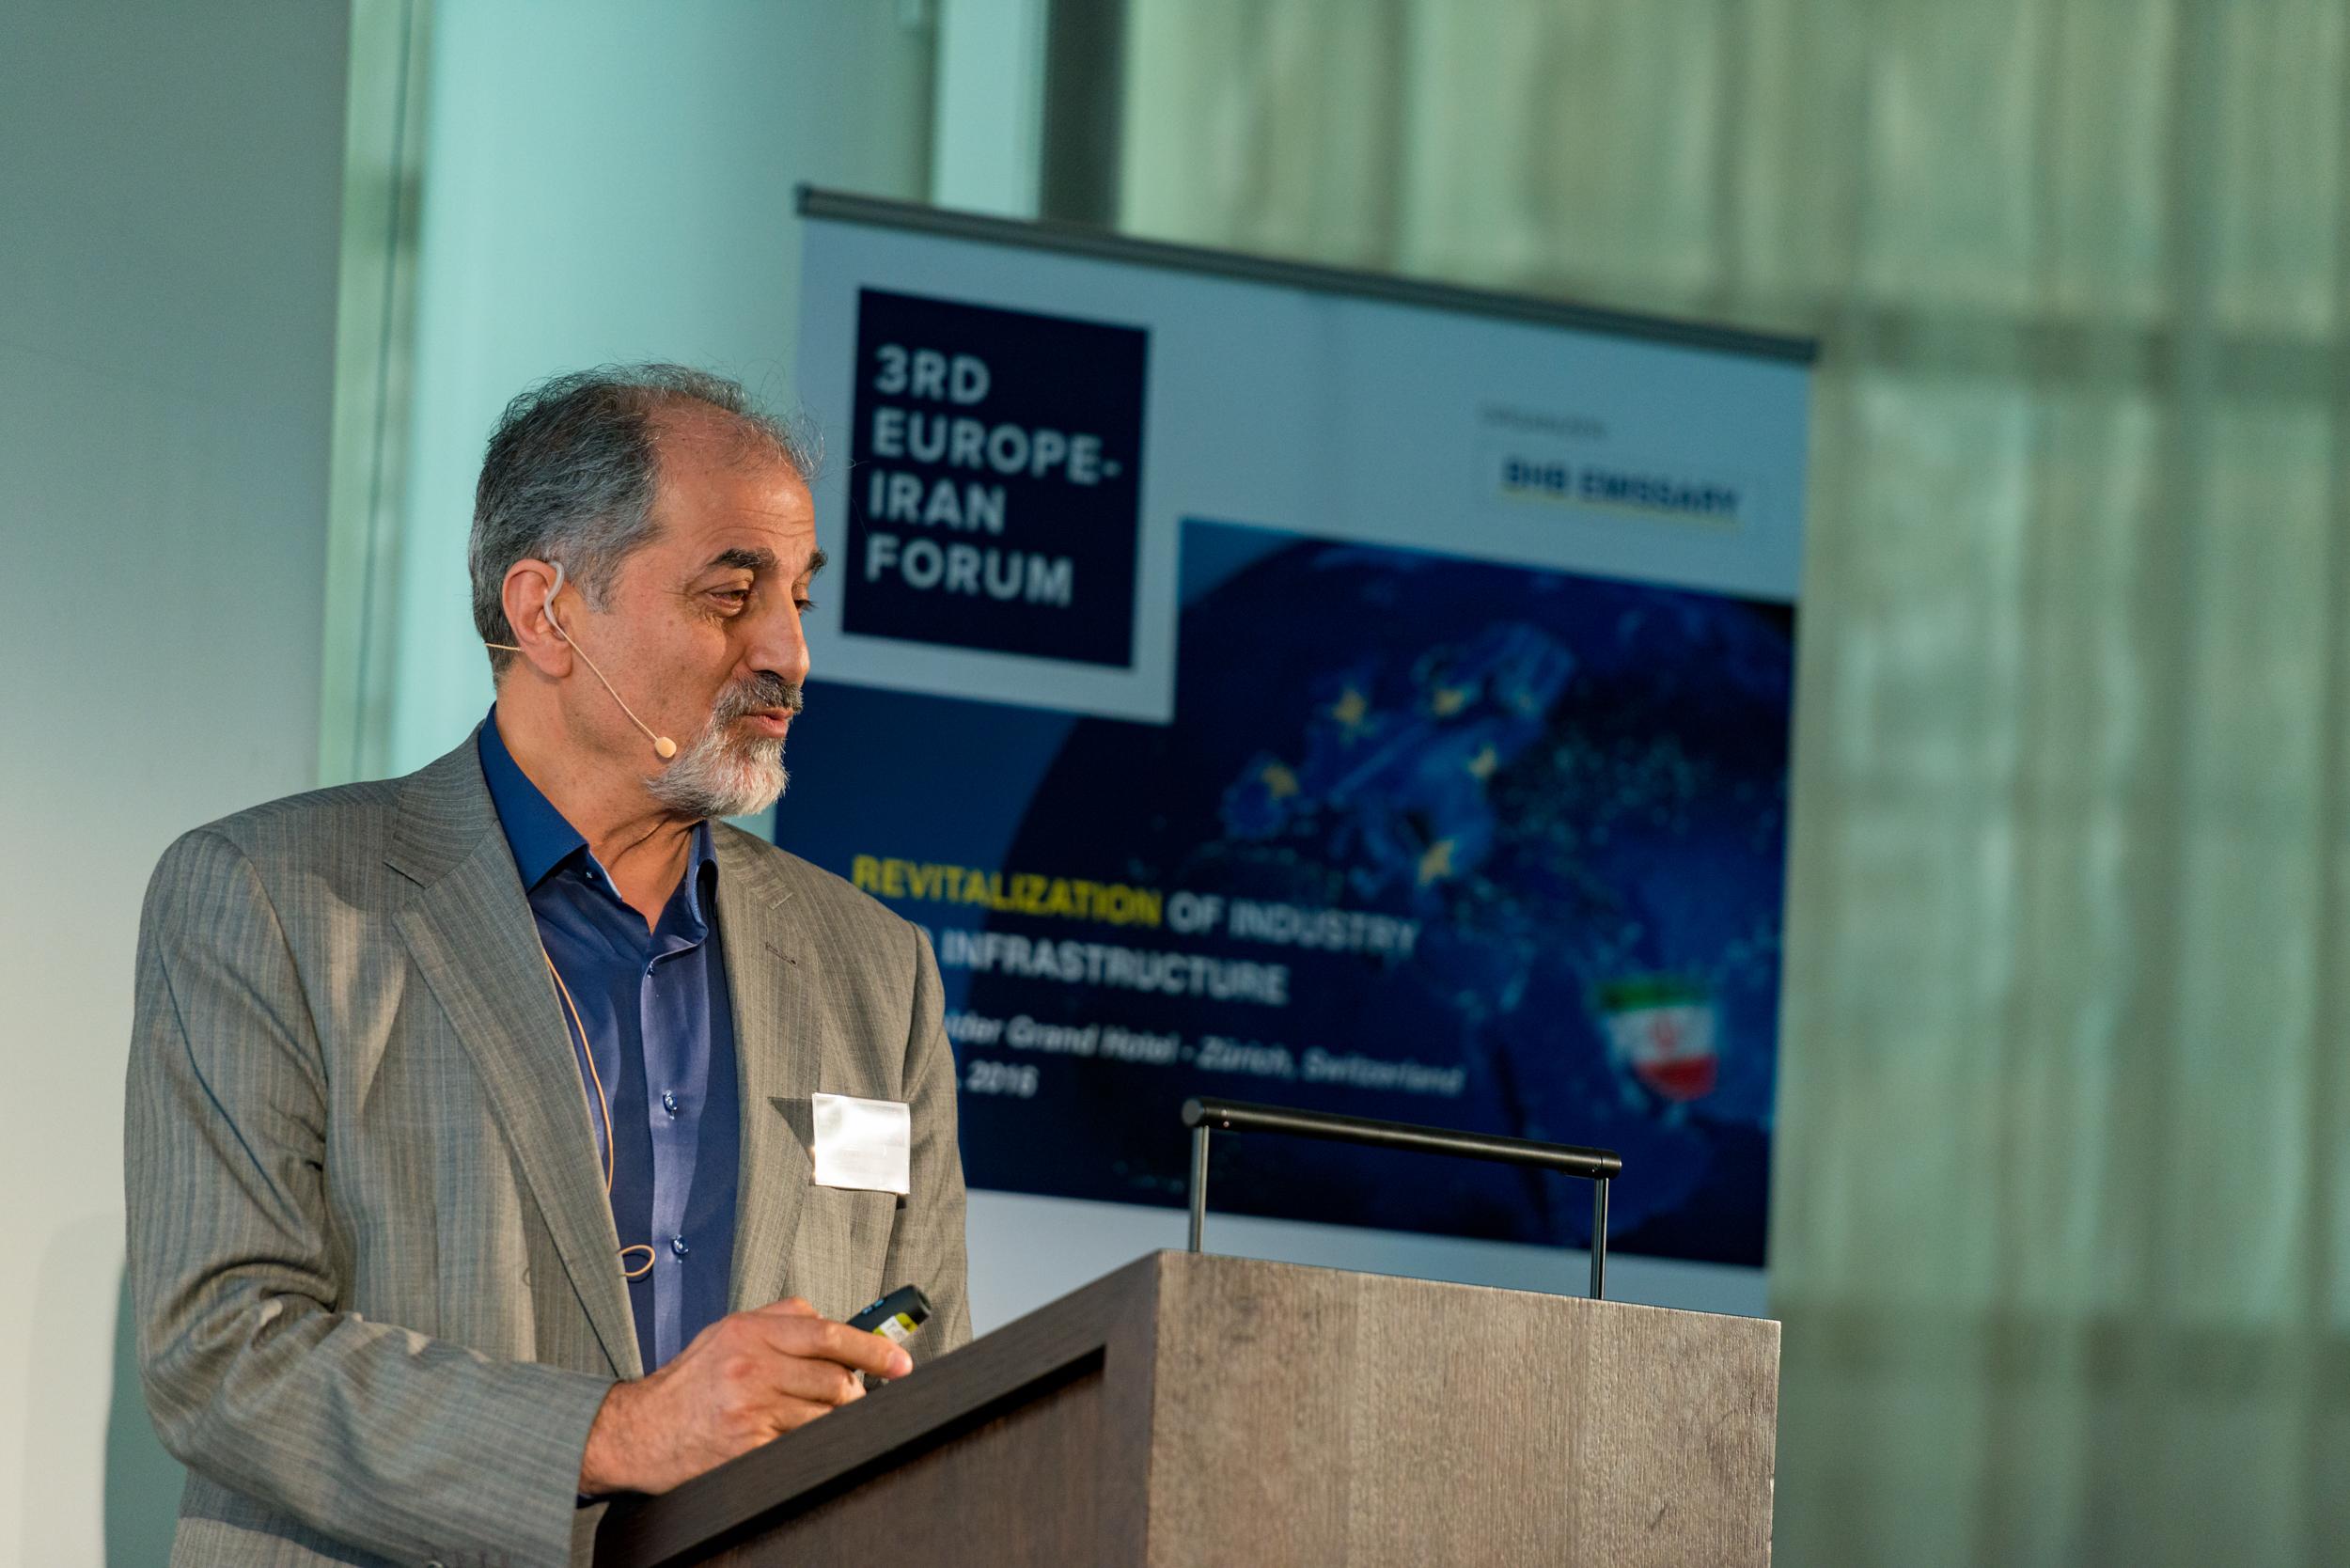 86.3rd Europe-Iran Forum_4.05.2016-Mai16.jpg